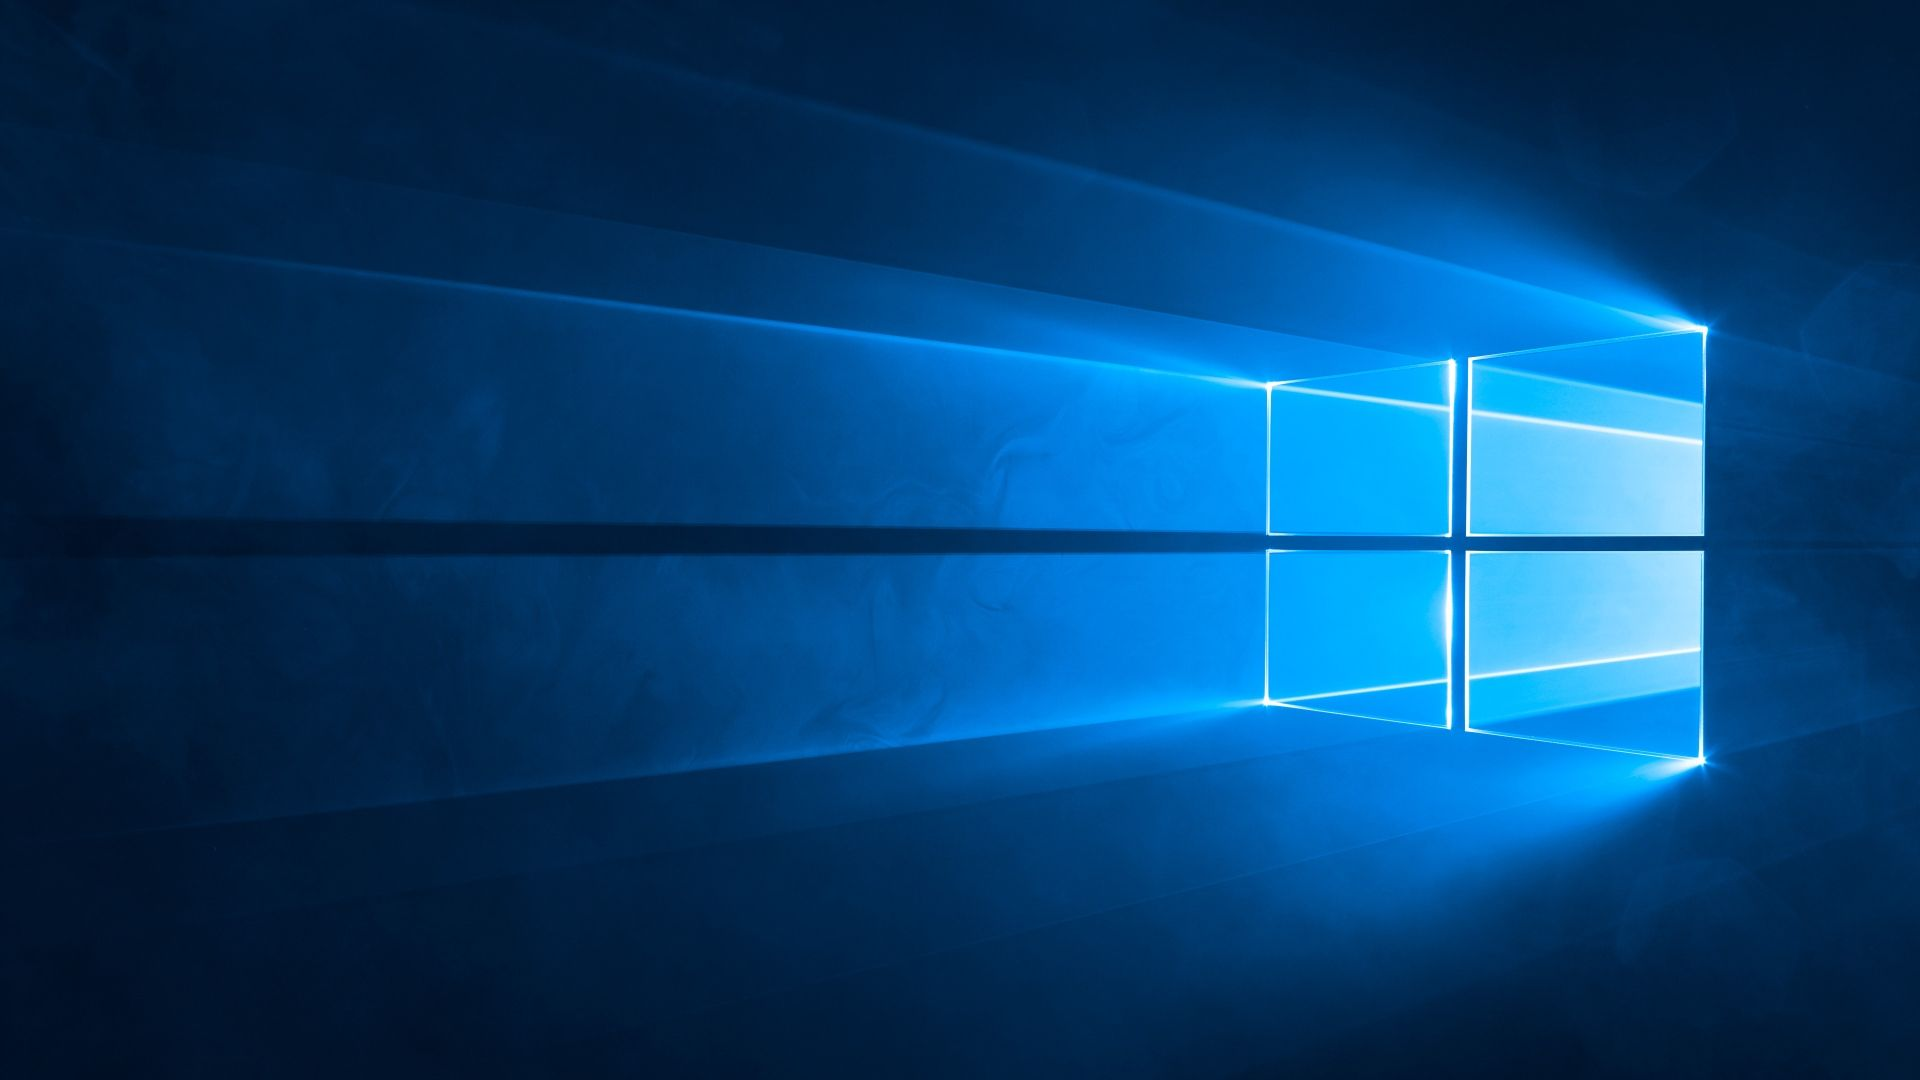 Full HD 1080p Windows Wallpapers HD, Desktop Backgrounds 1920x1080 ...